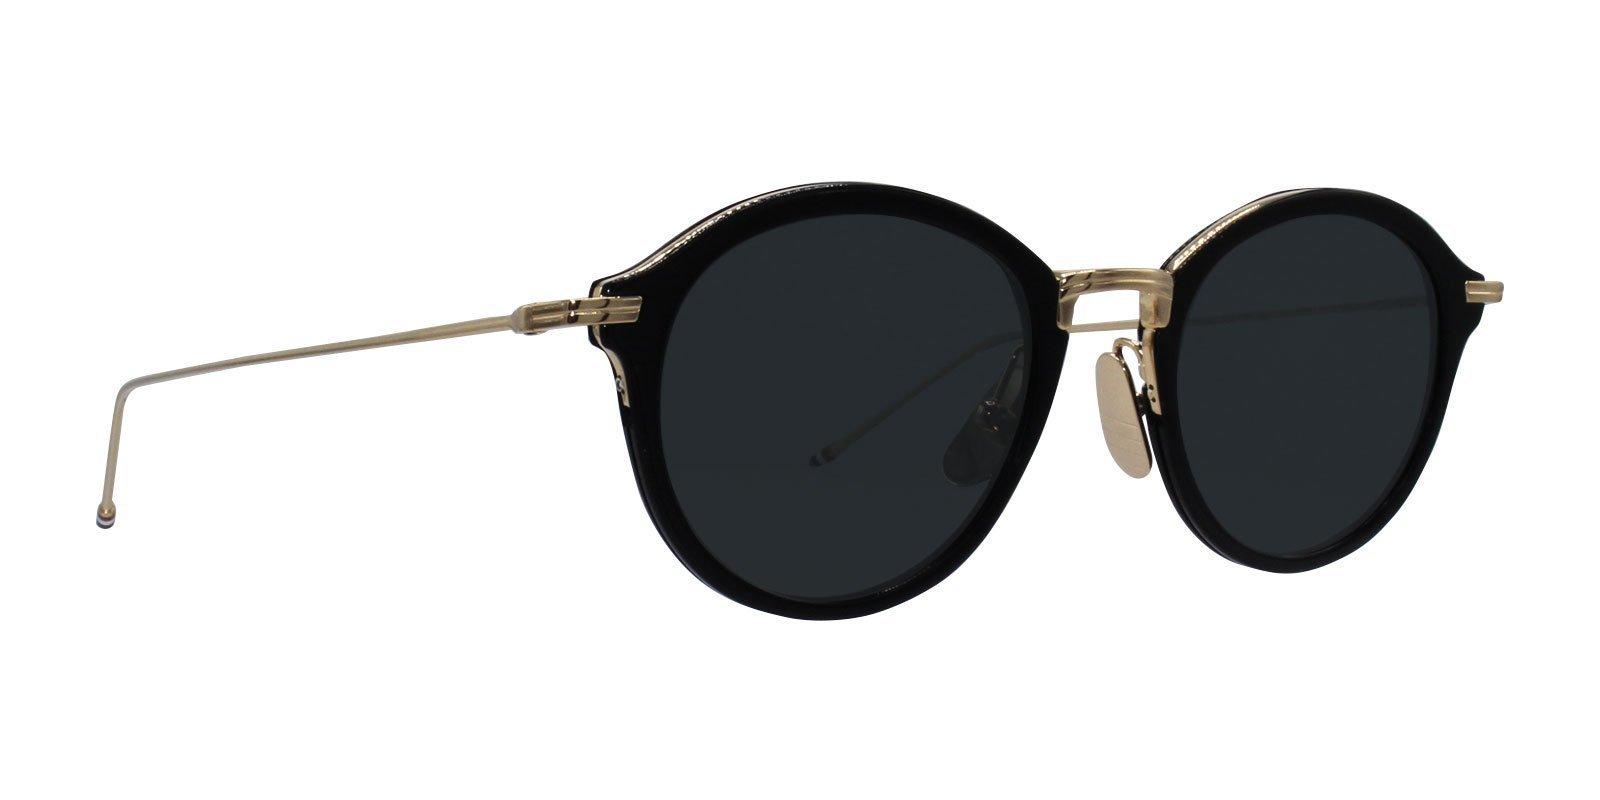 c1d9f9662487 Thom Browne - TB-908 Black Gold - Green-sunglasses-Designer Eyes ...